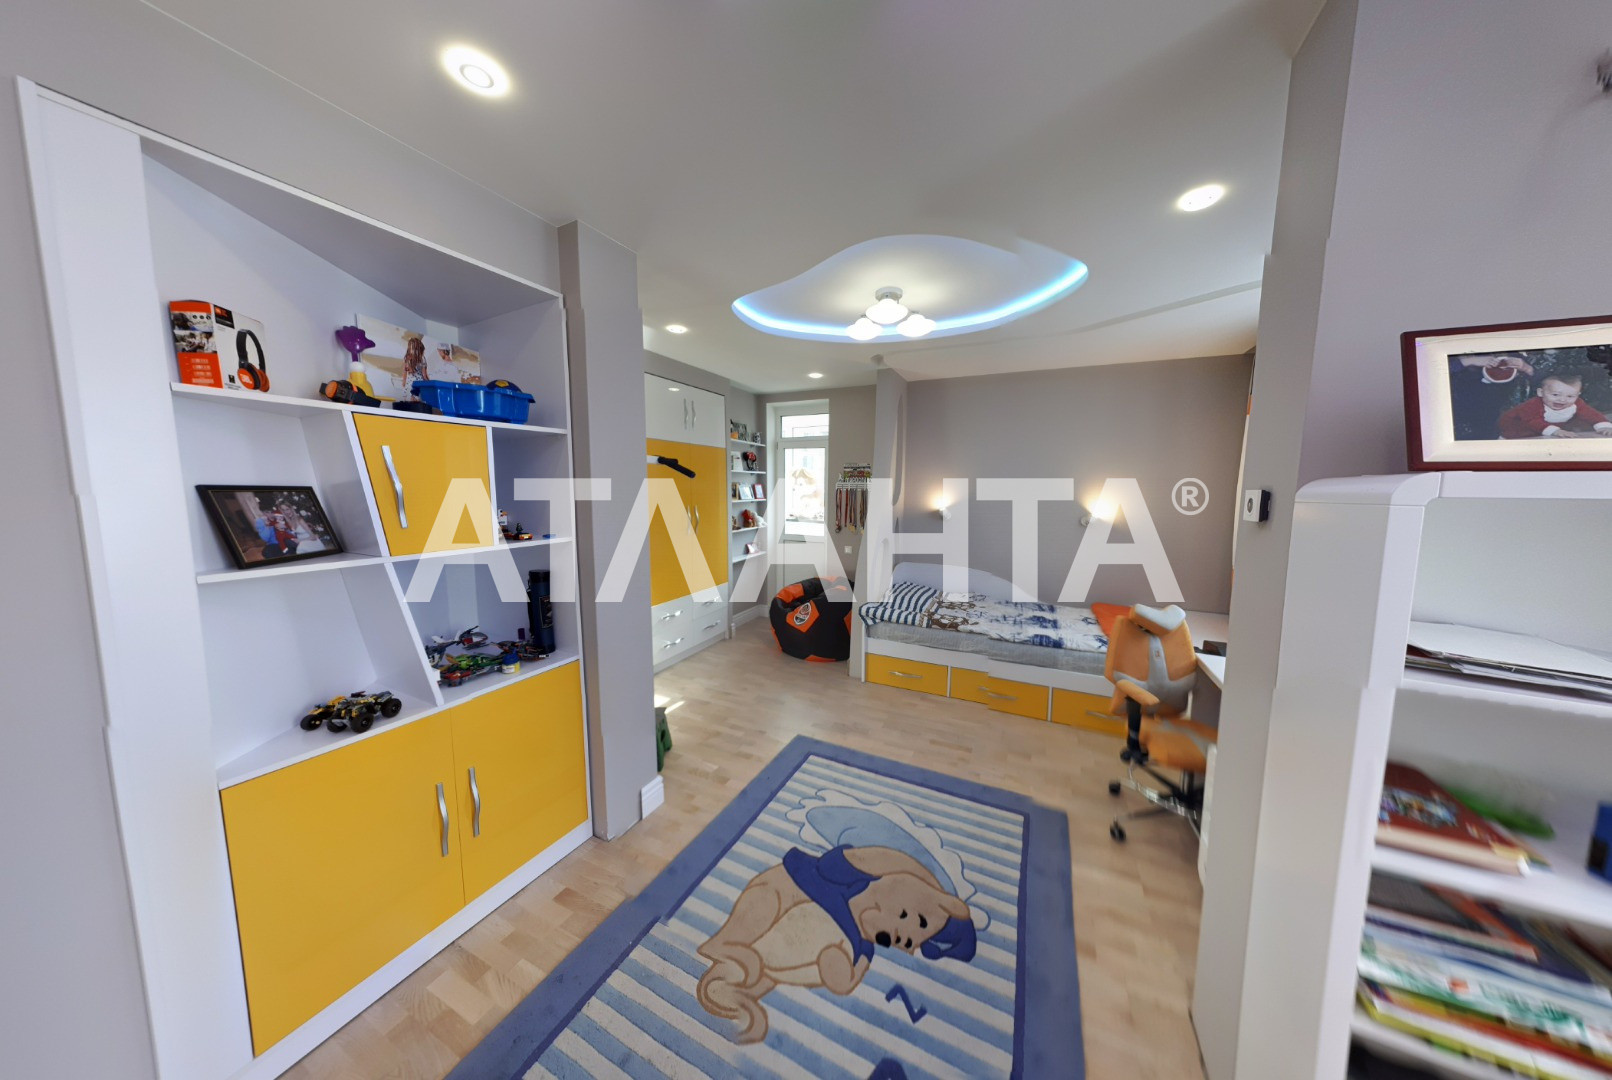 Продается 3-комнатная Квартира на ул. Ул. Ломоносова — 230 000 у.е. (фото №9)